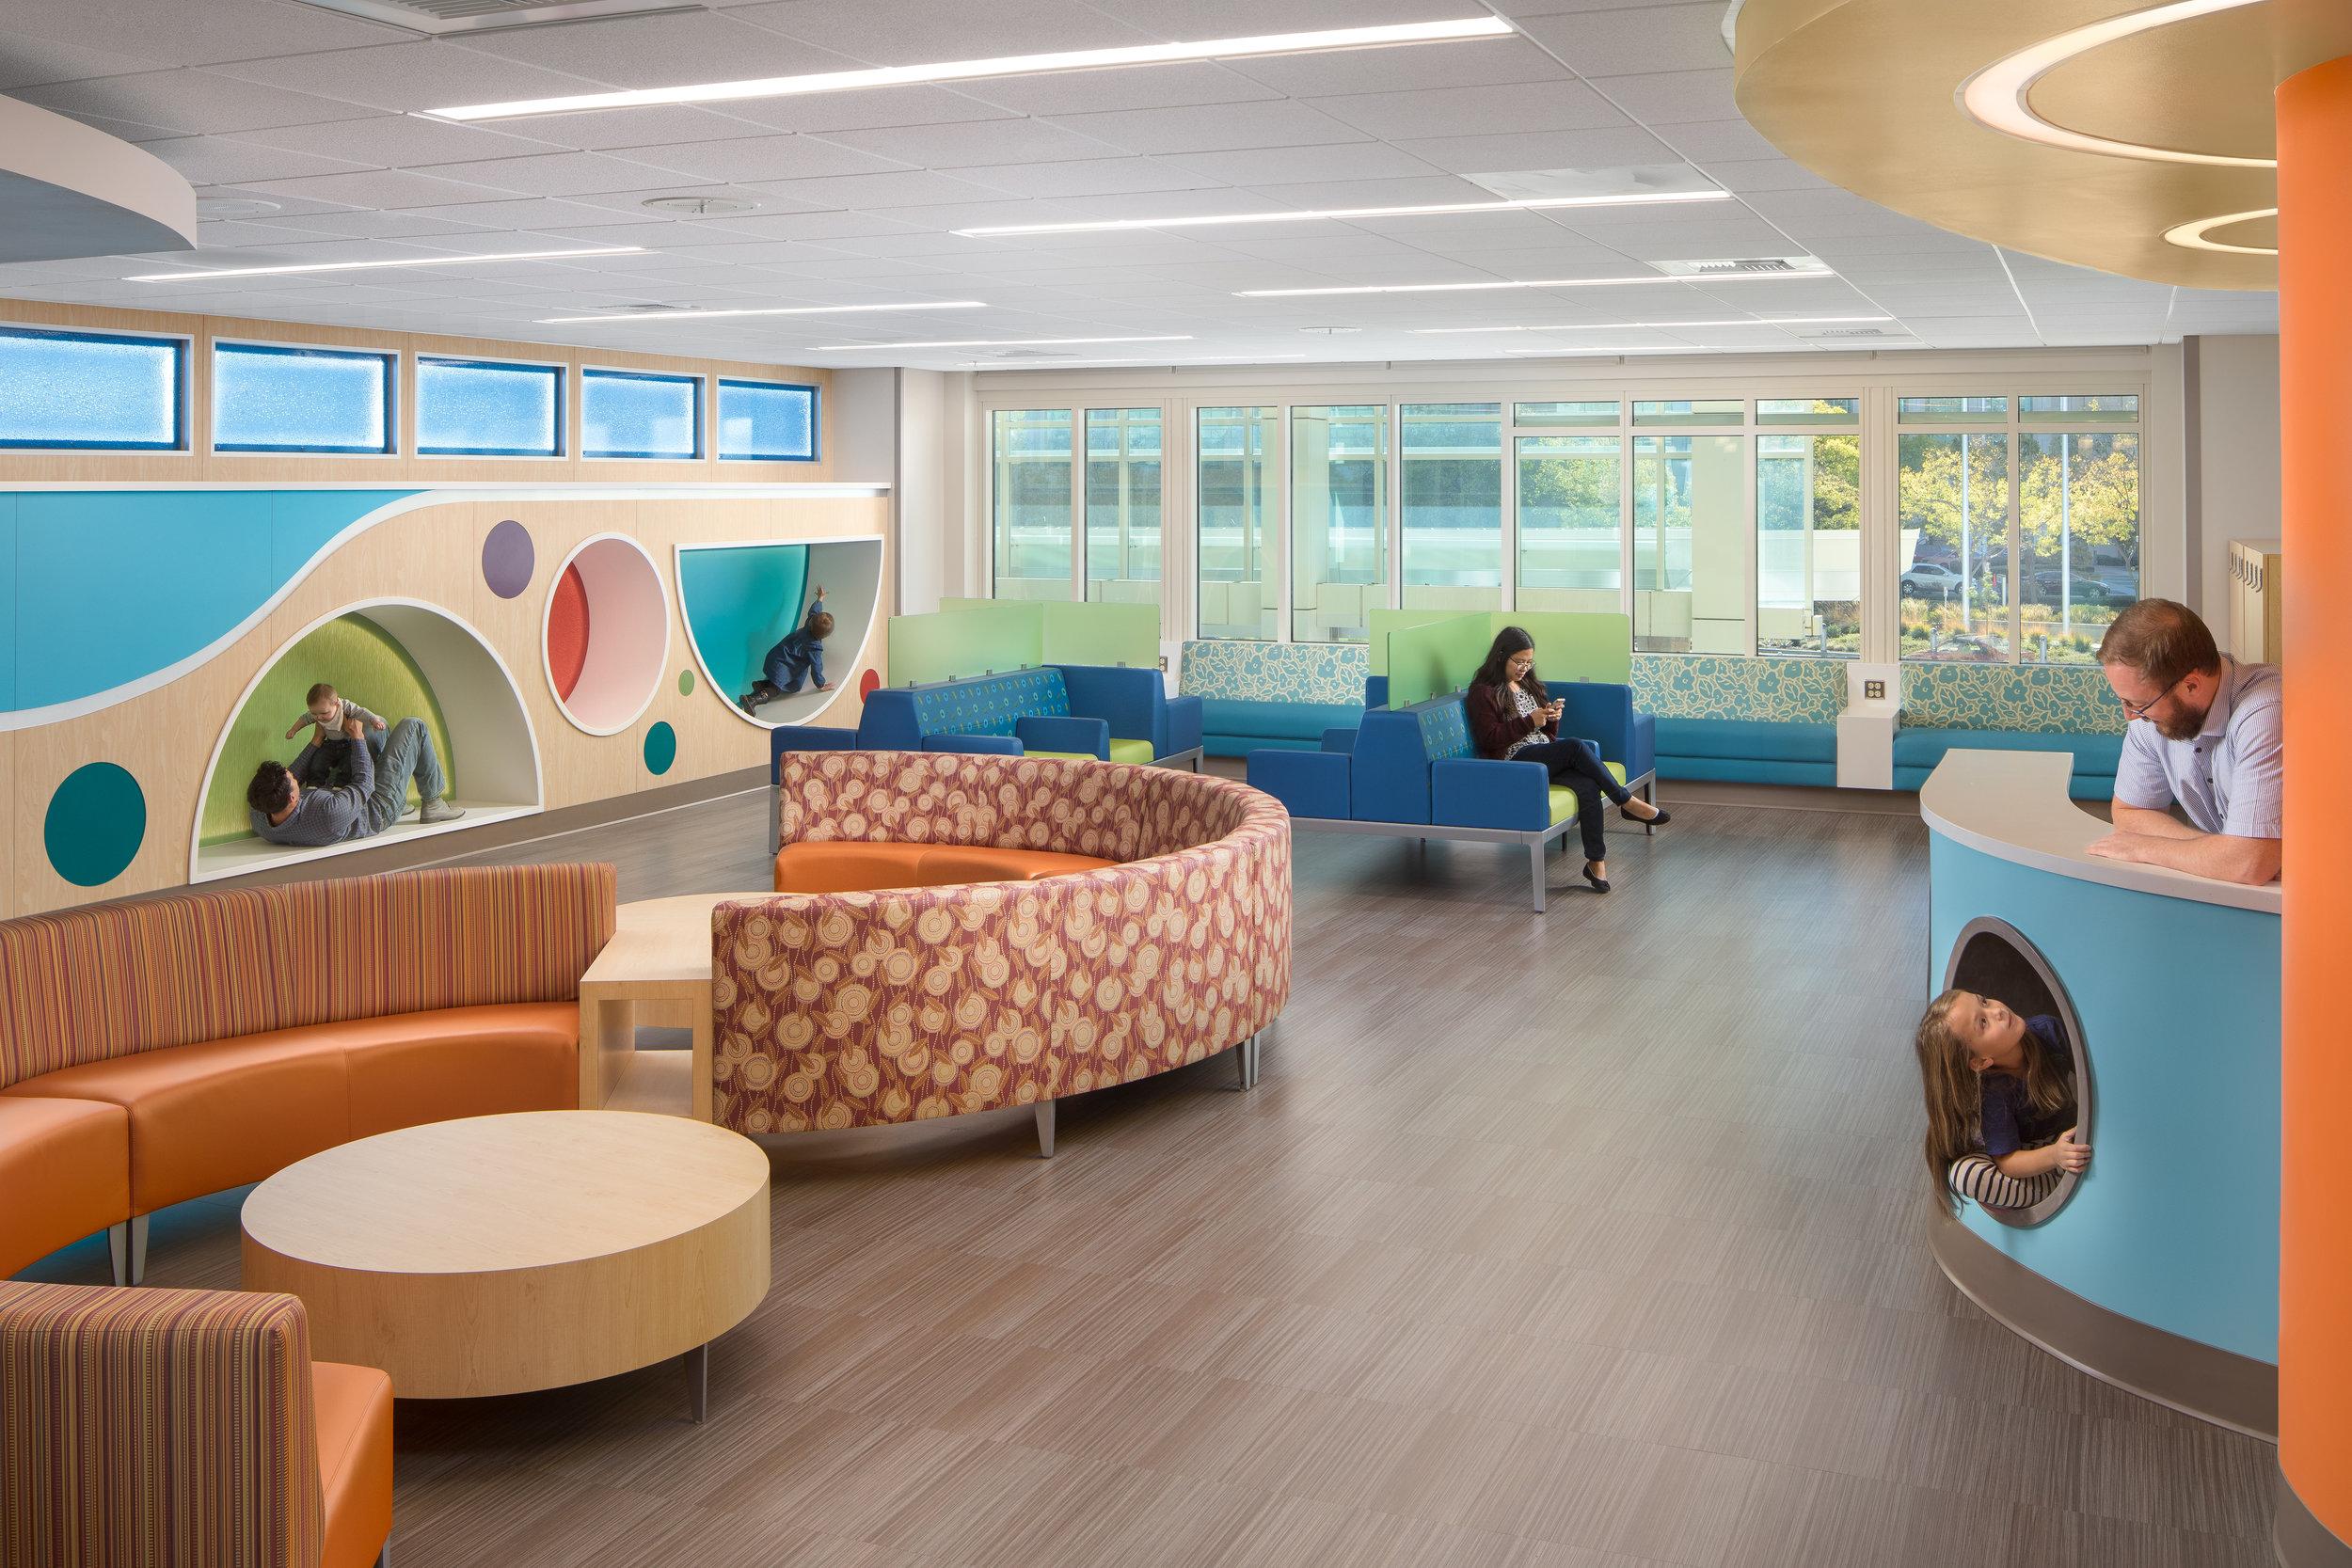 Medical:    UC Davis Pediatric Hospital